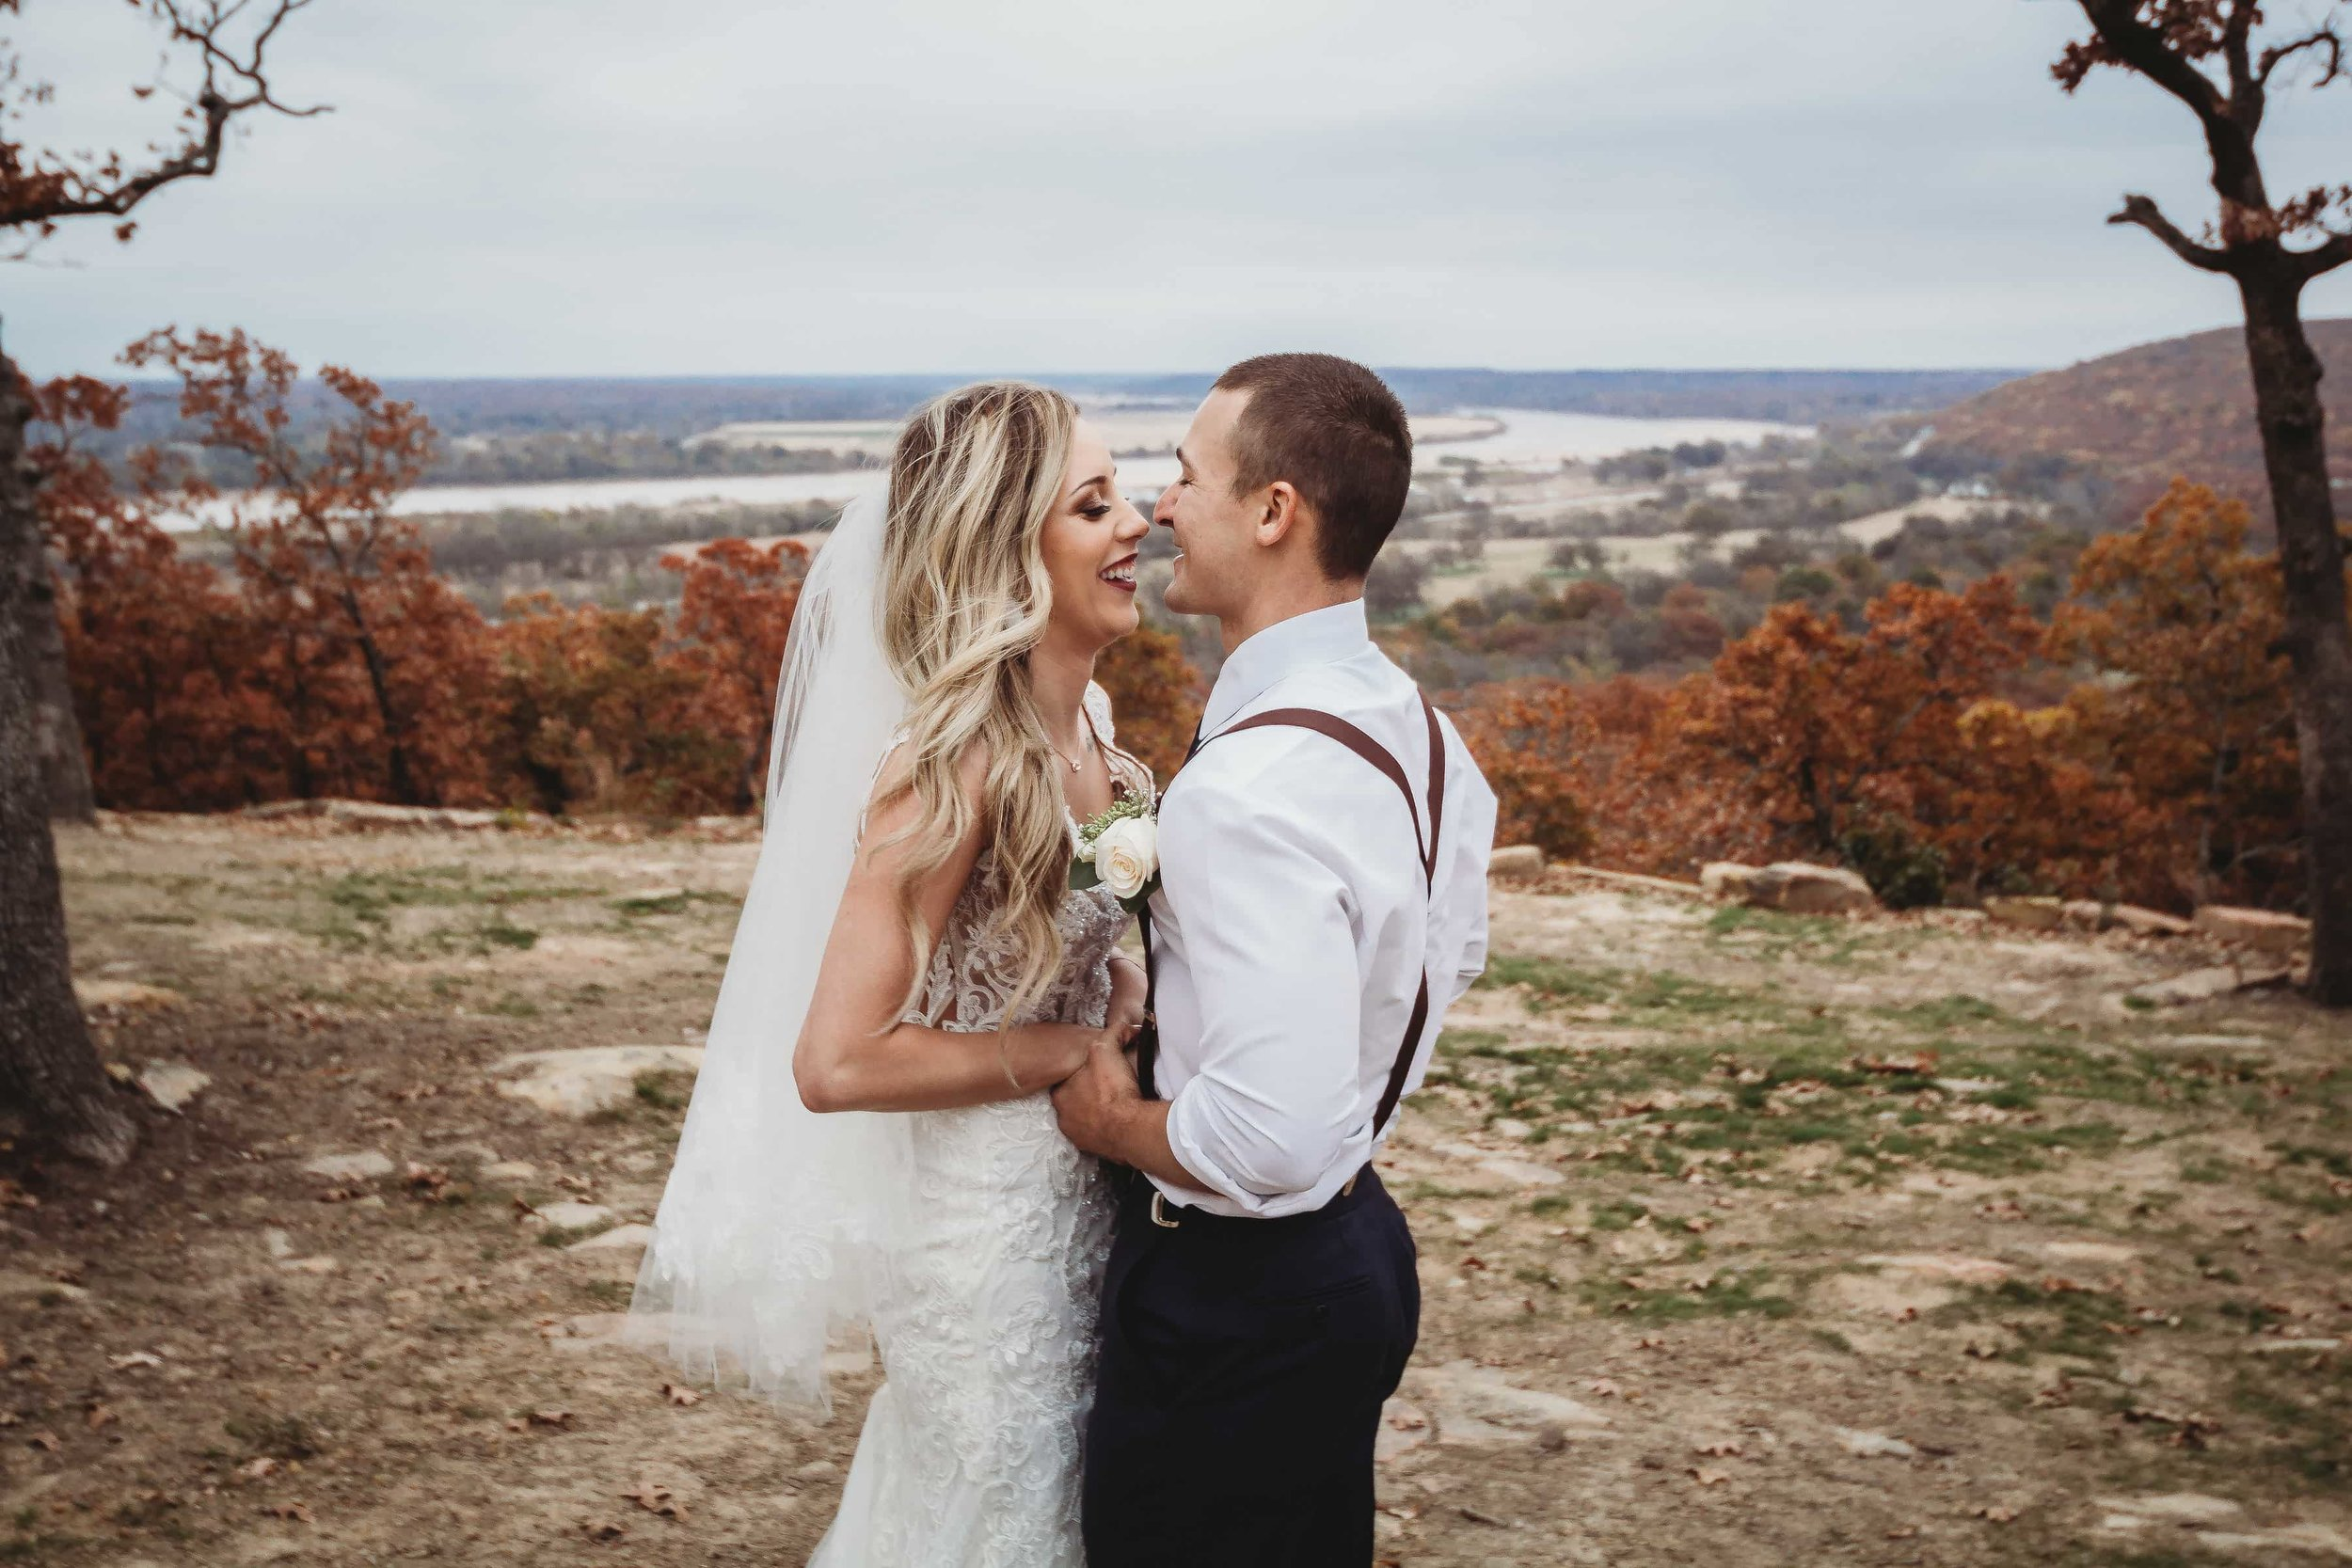 Outdoor Wedding Venue Tulsa 16-min.jpg